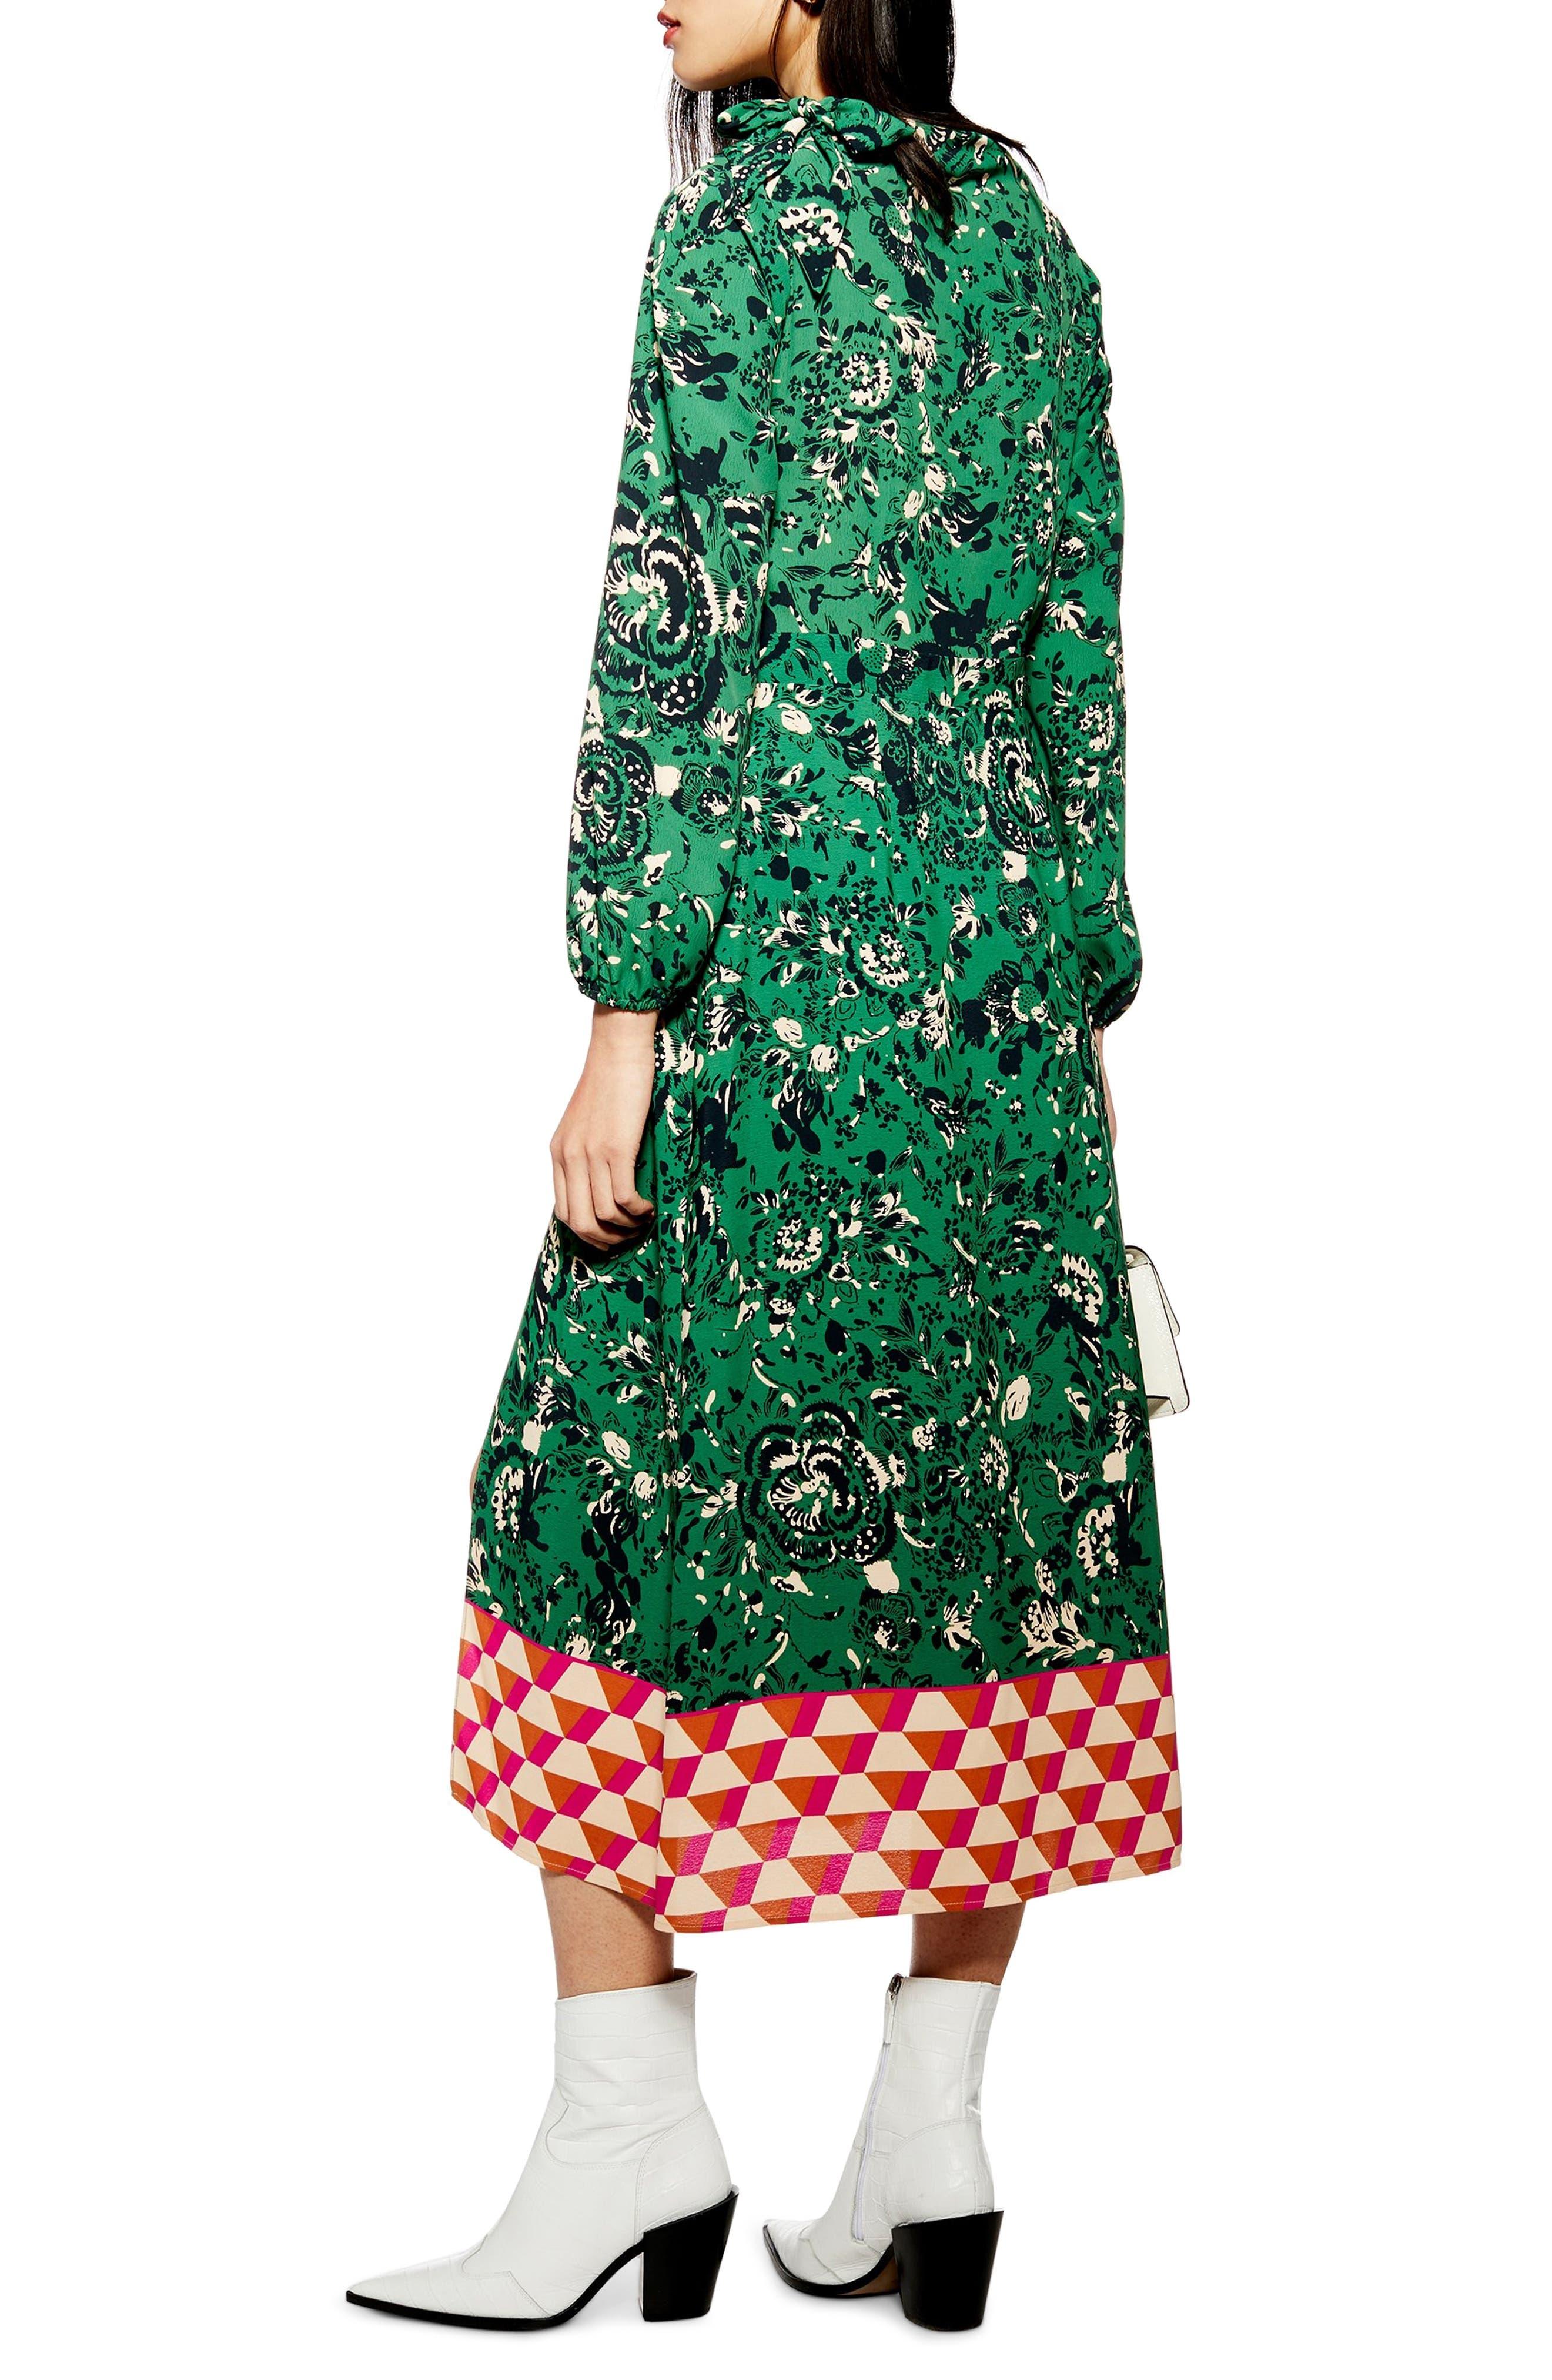 TOPSHOP, Geo Border Tie Neck Midi Dress, Alternate thumbnail 2, color, GREEN MULTI